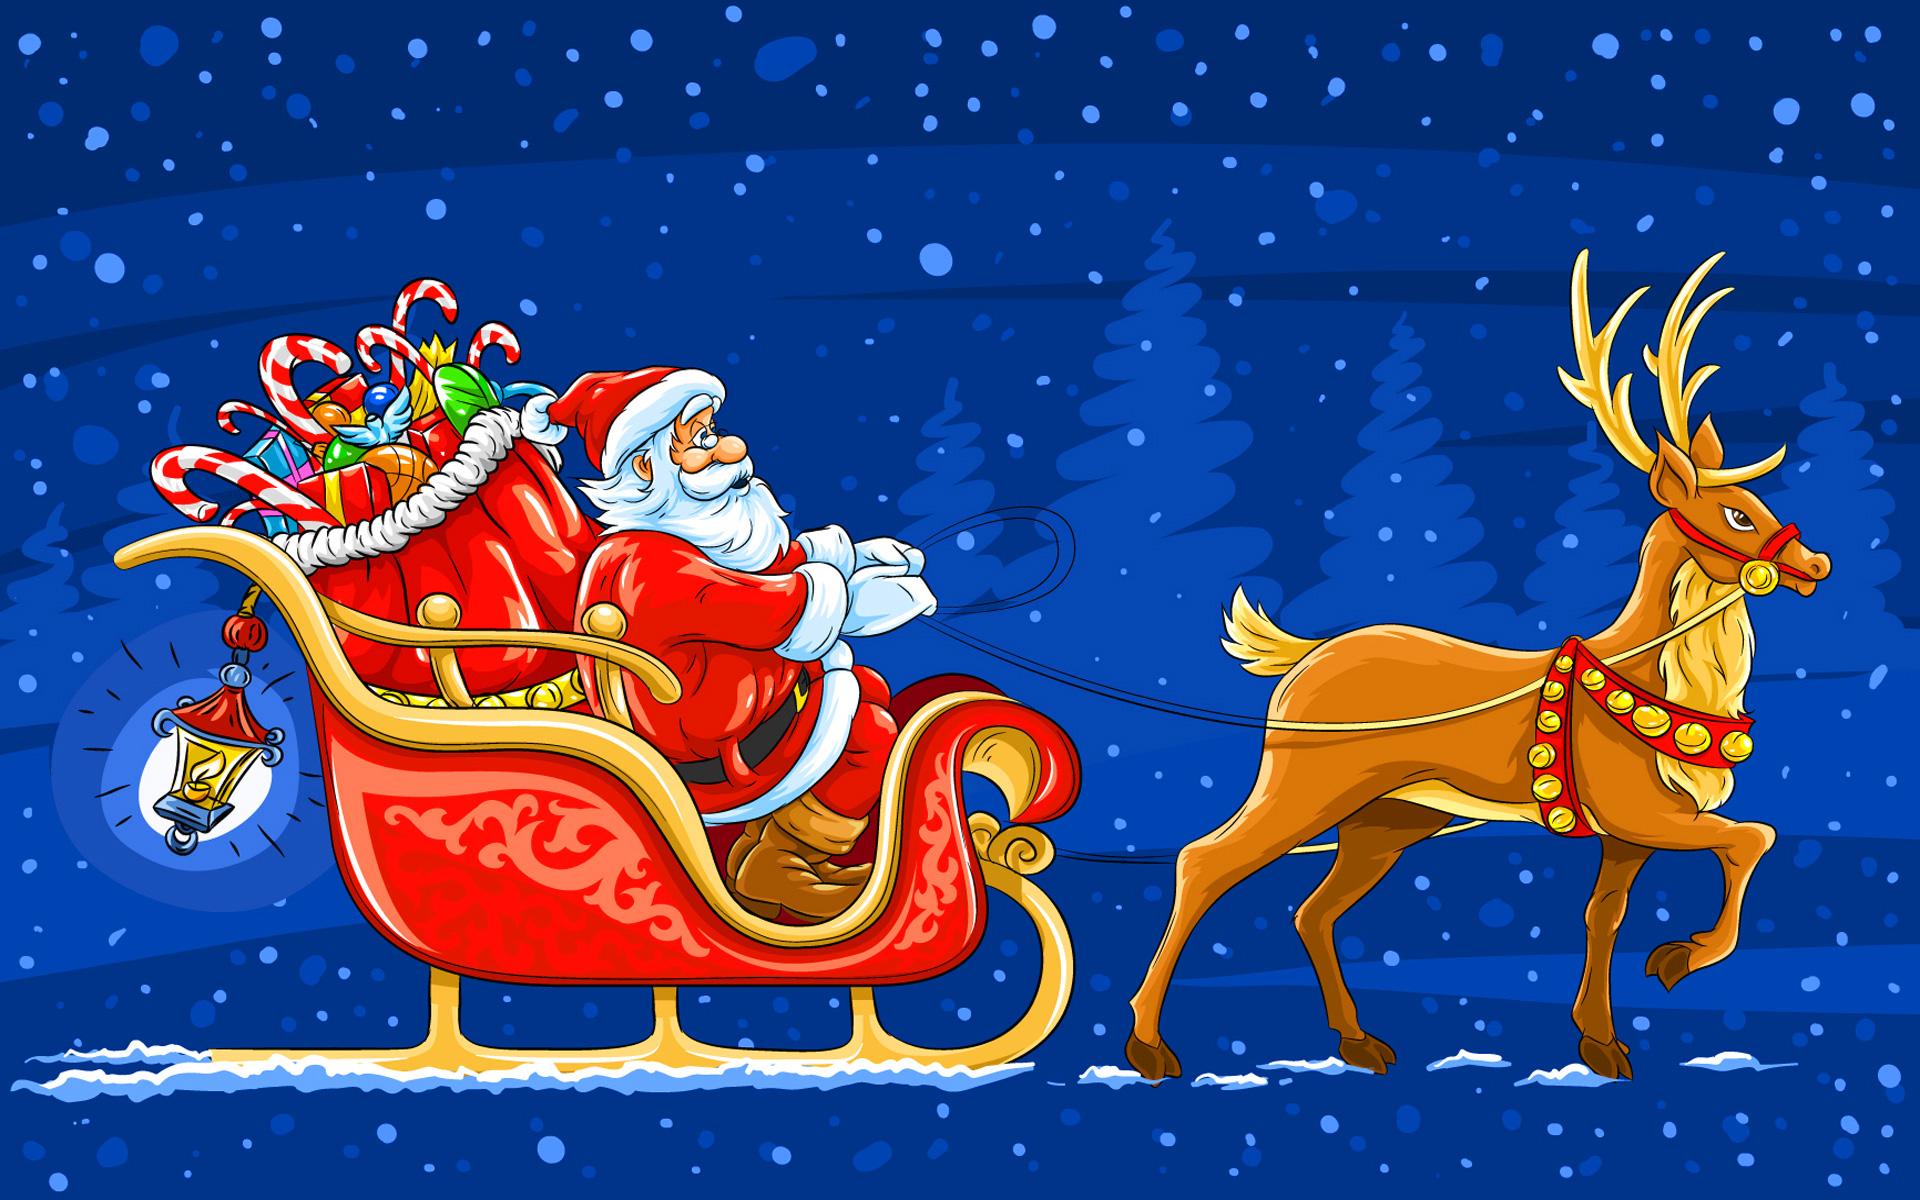 Sleigh clipart jpeg. Santa with blue background